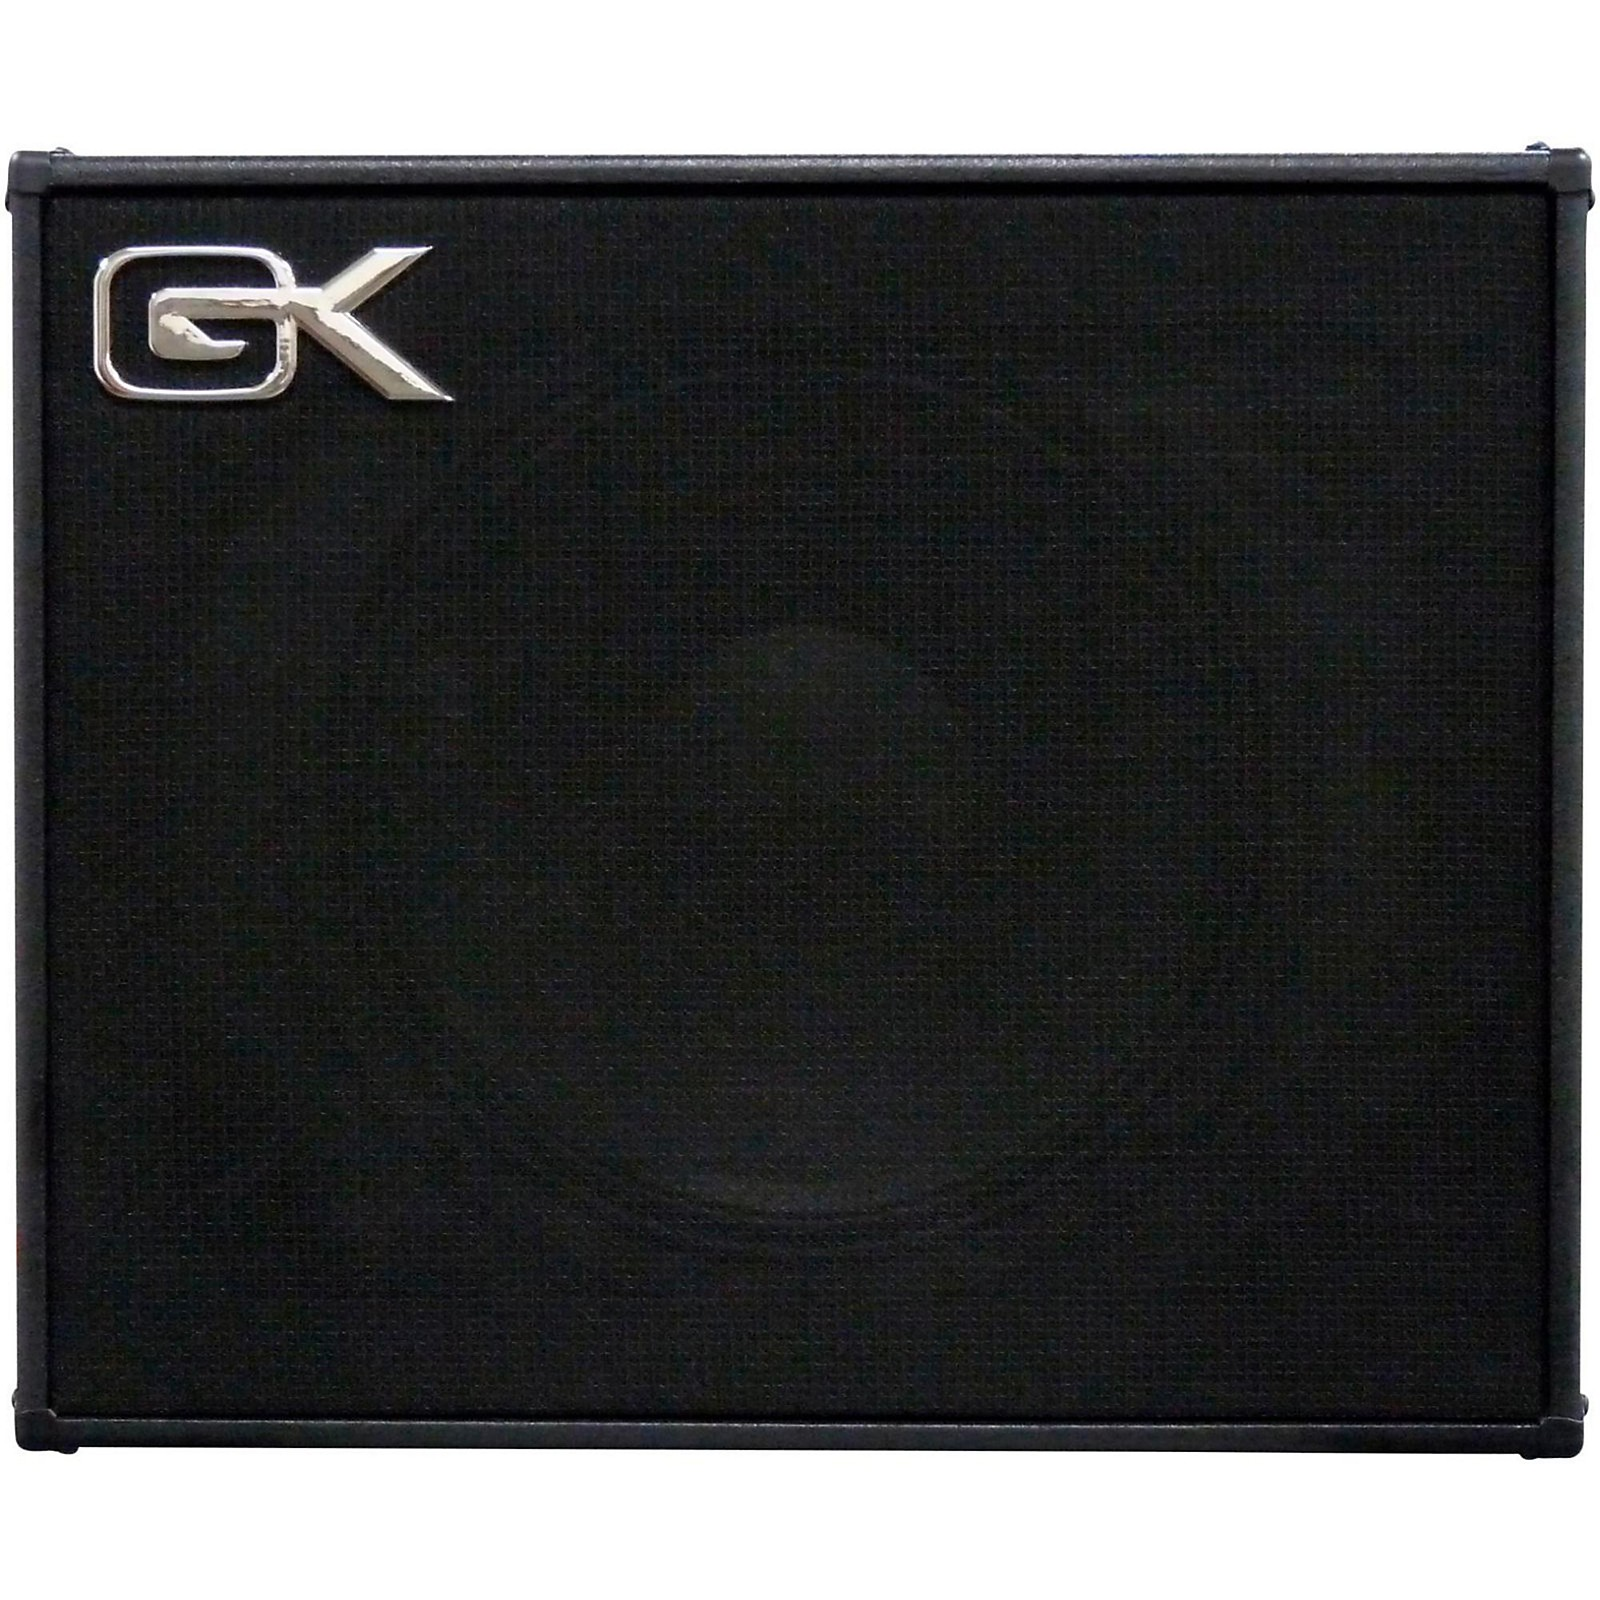 Open Box Gallien-Krueger CX115 300W 1x15 Bass Speaker Cabinet